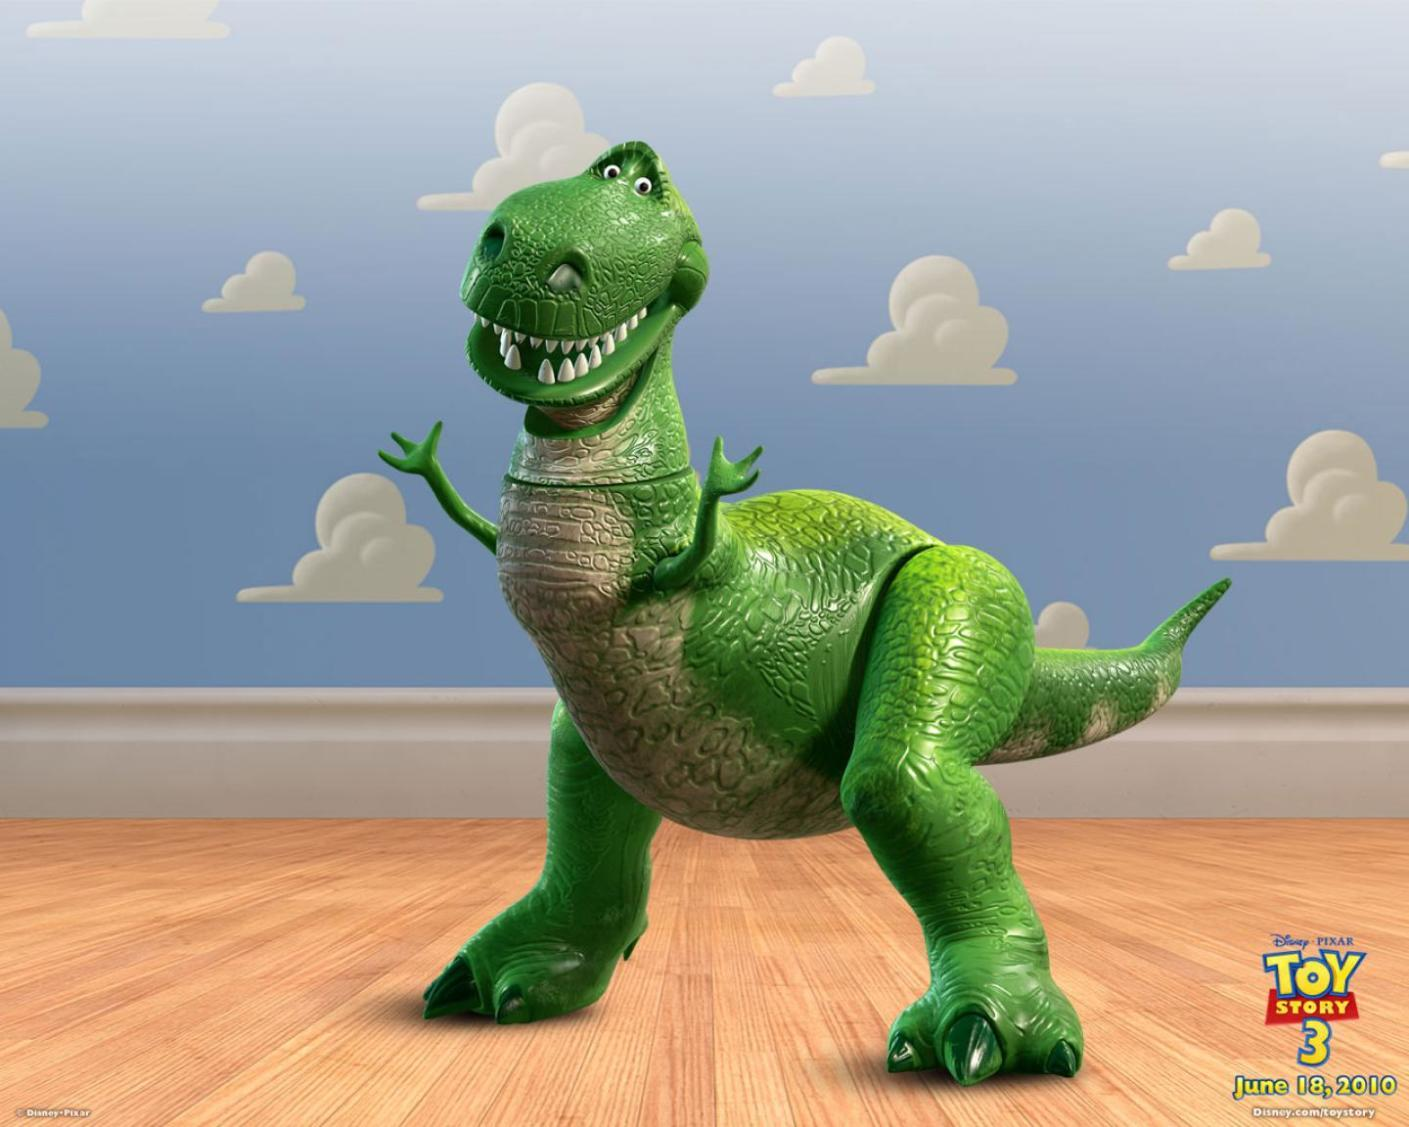 T-Rex Toy Story - Original image